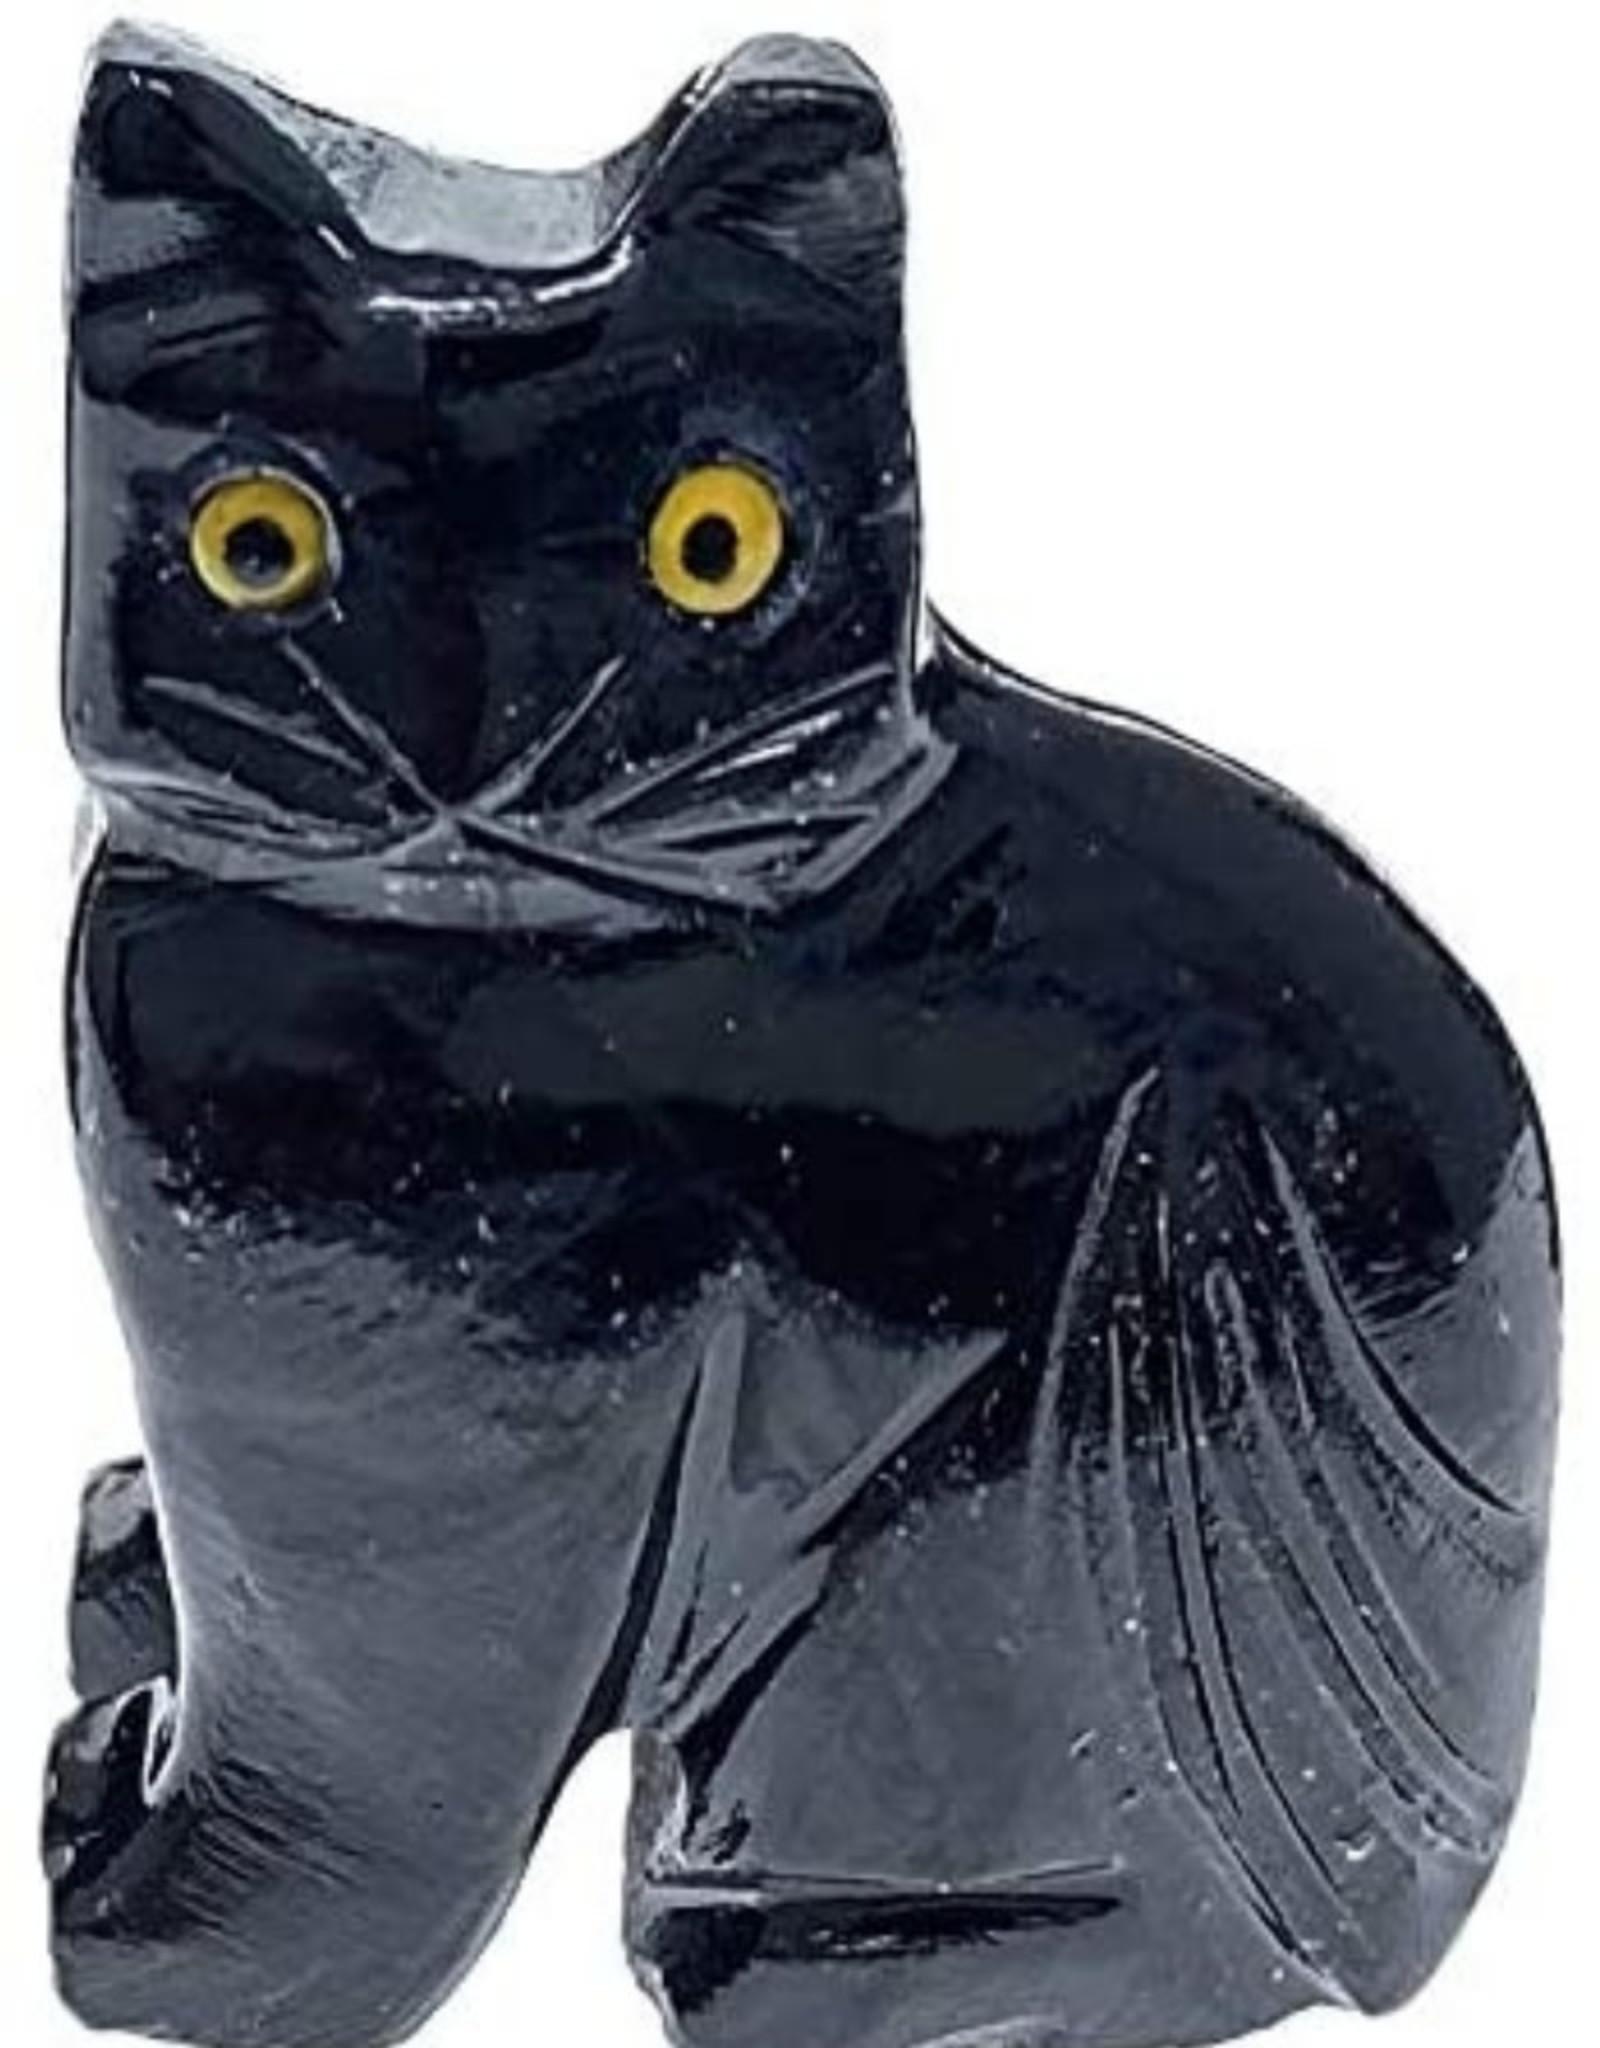 Black Onyx Cat - Stone Animal